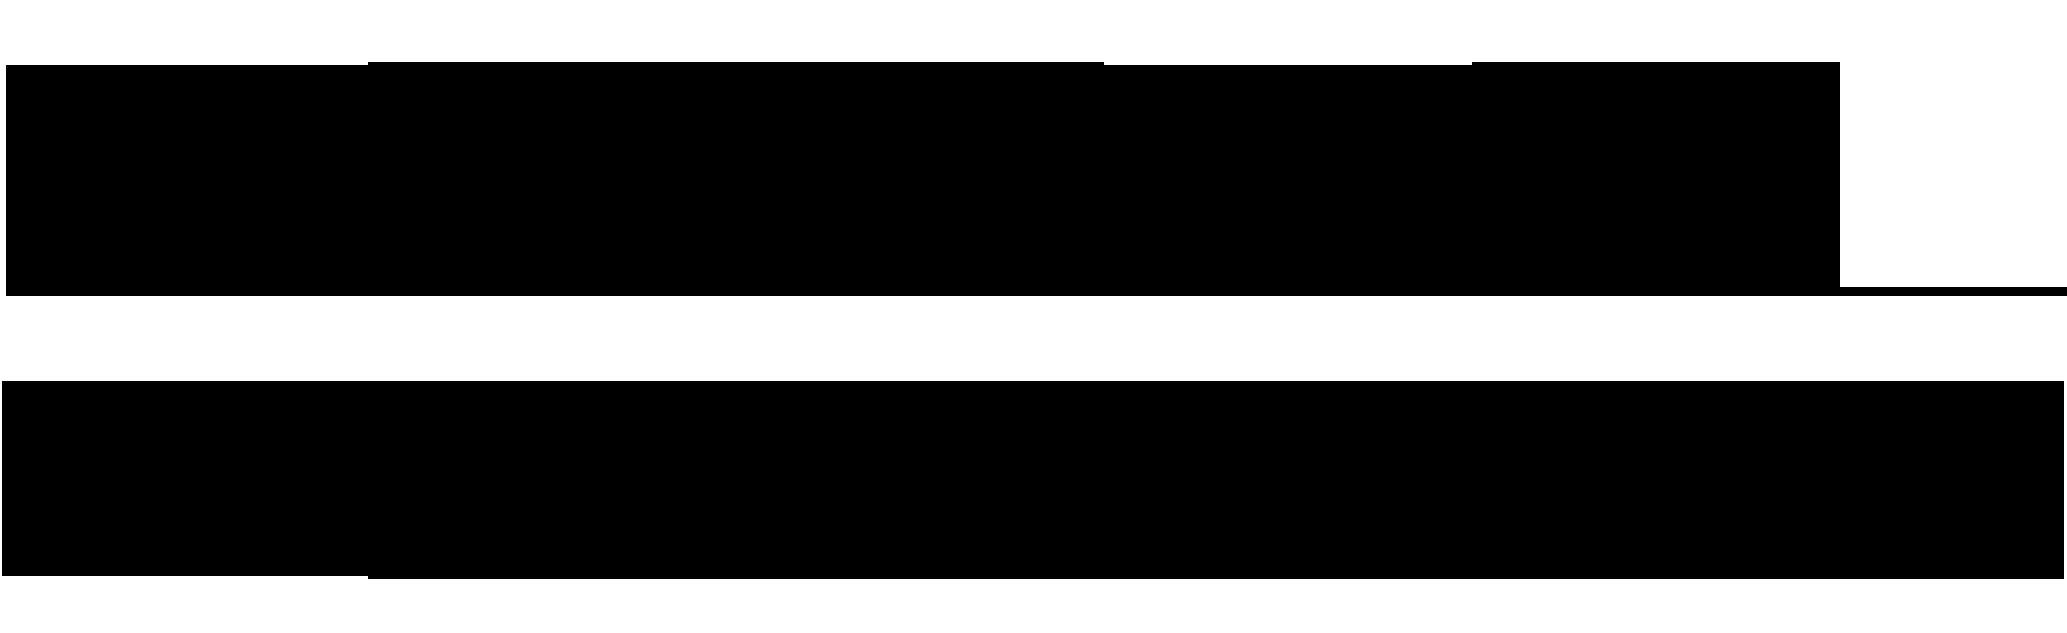 Frontespizio